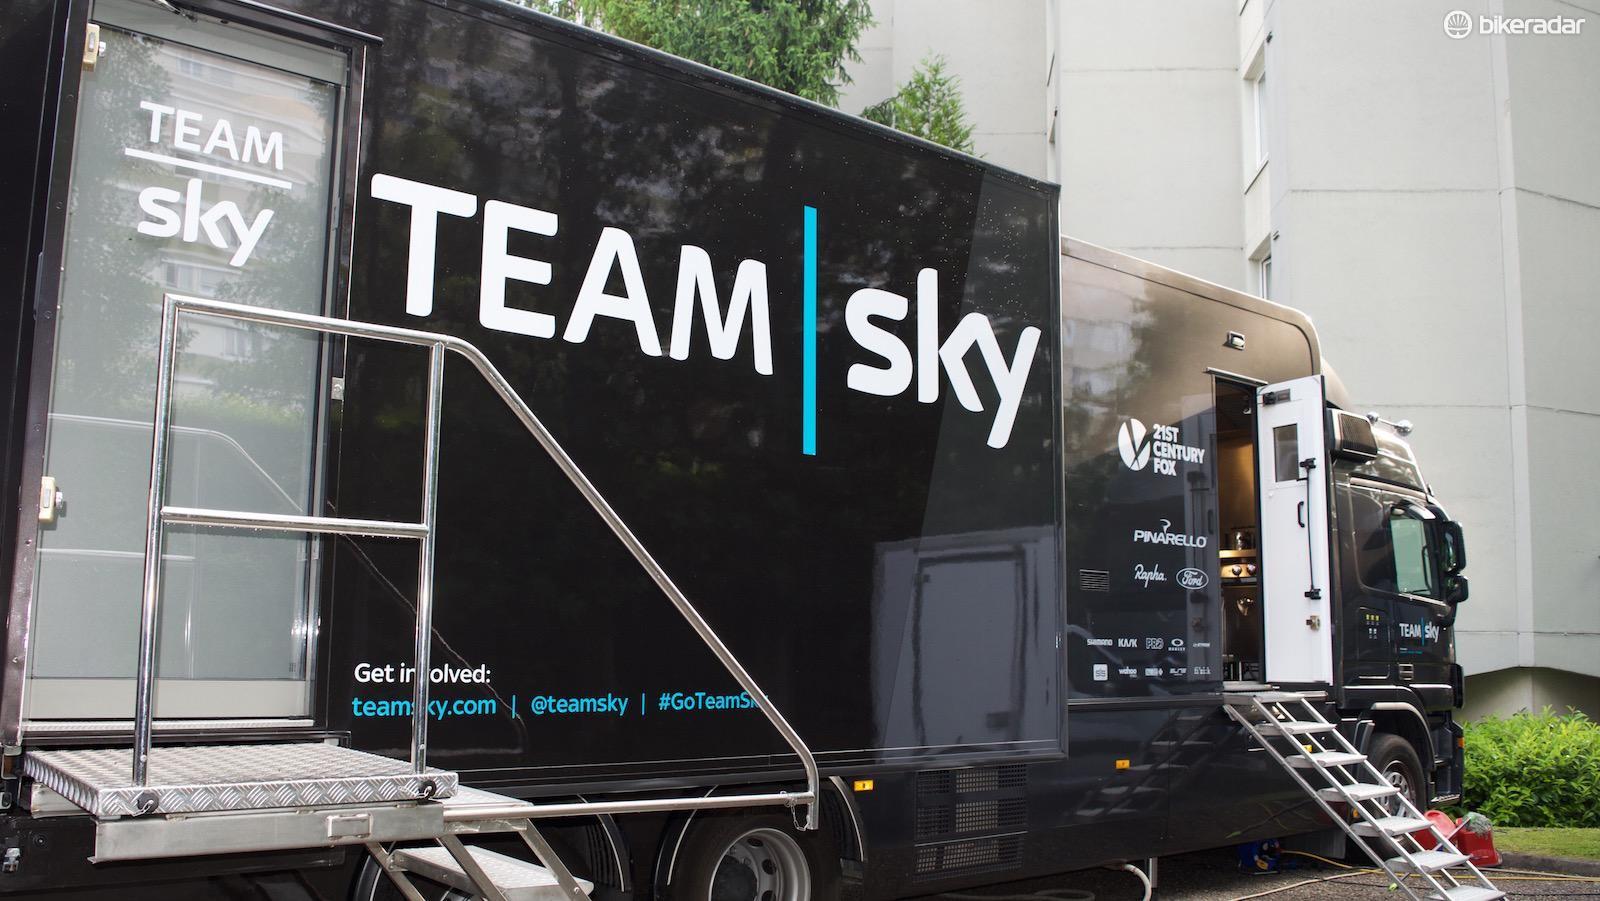 The Team Sky kitchen truck